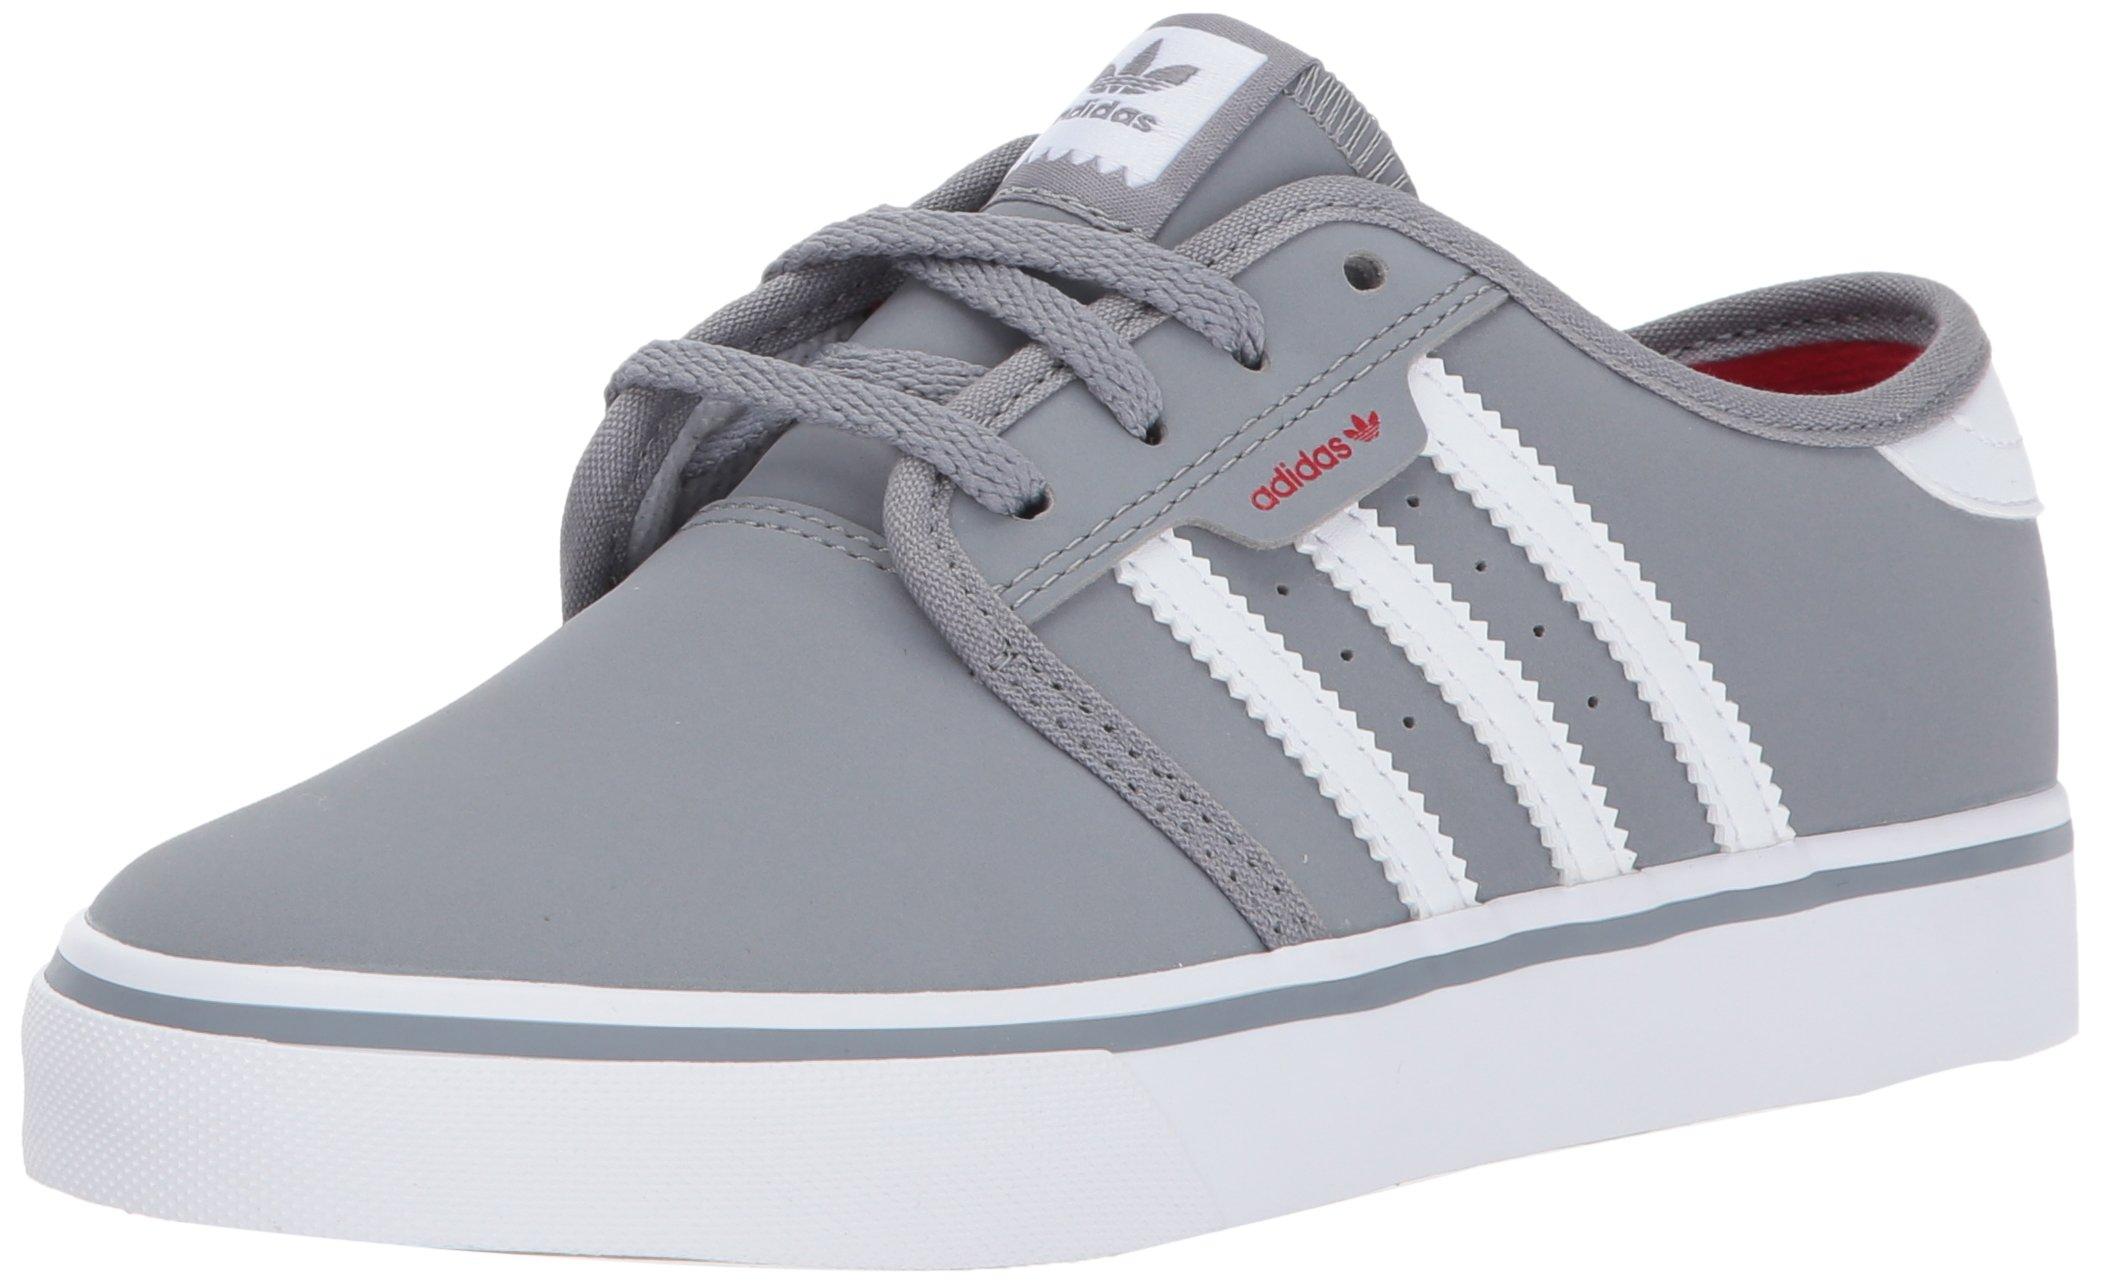 adidas Unisex-Kids Seeley J Skate Shoe, Grey, FTWR White, Scarlet, 3 M US Little Kid